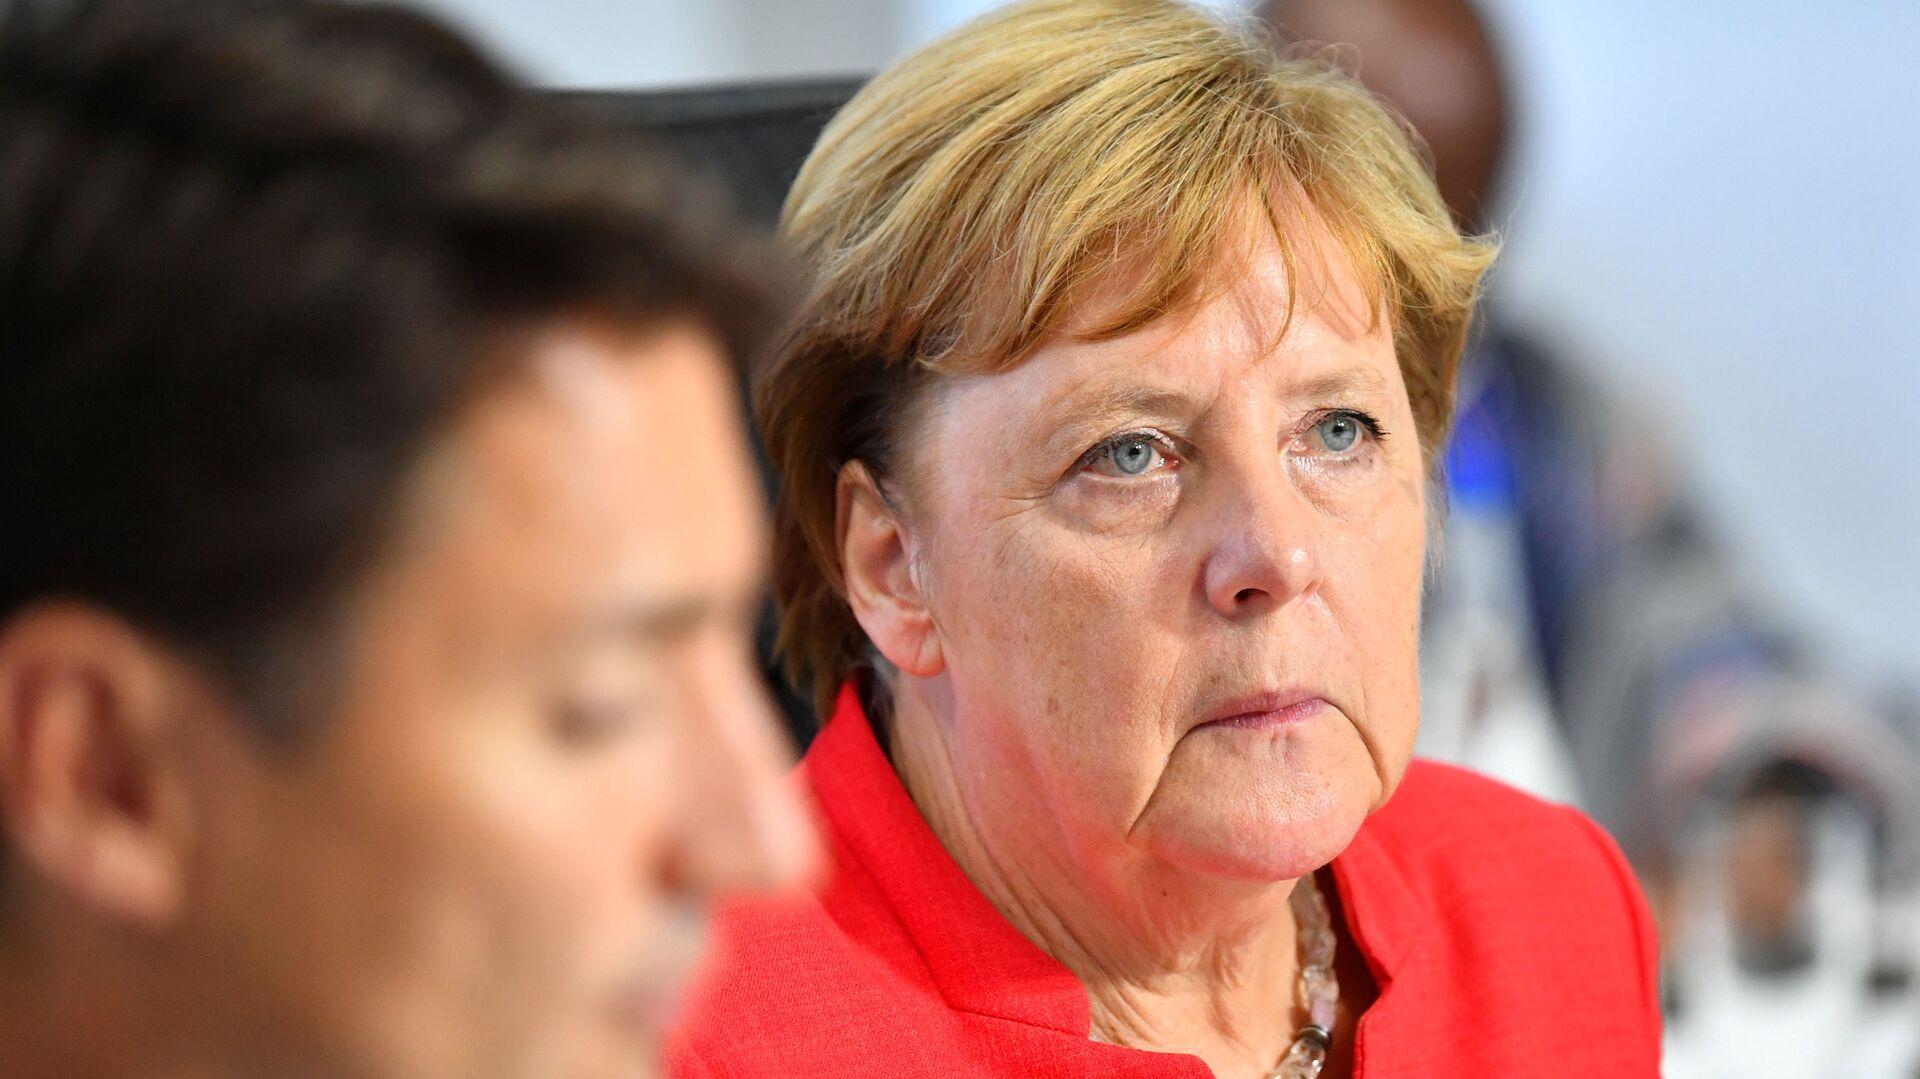 Angela Merkel, la canciller de Alemania - Sputnik Mundo, 1920, 31.05.2021